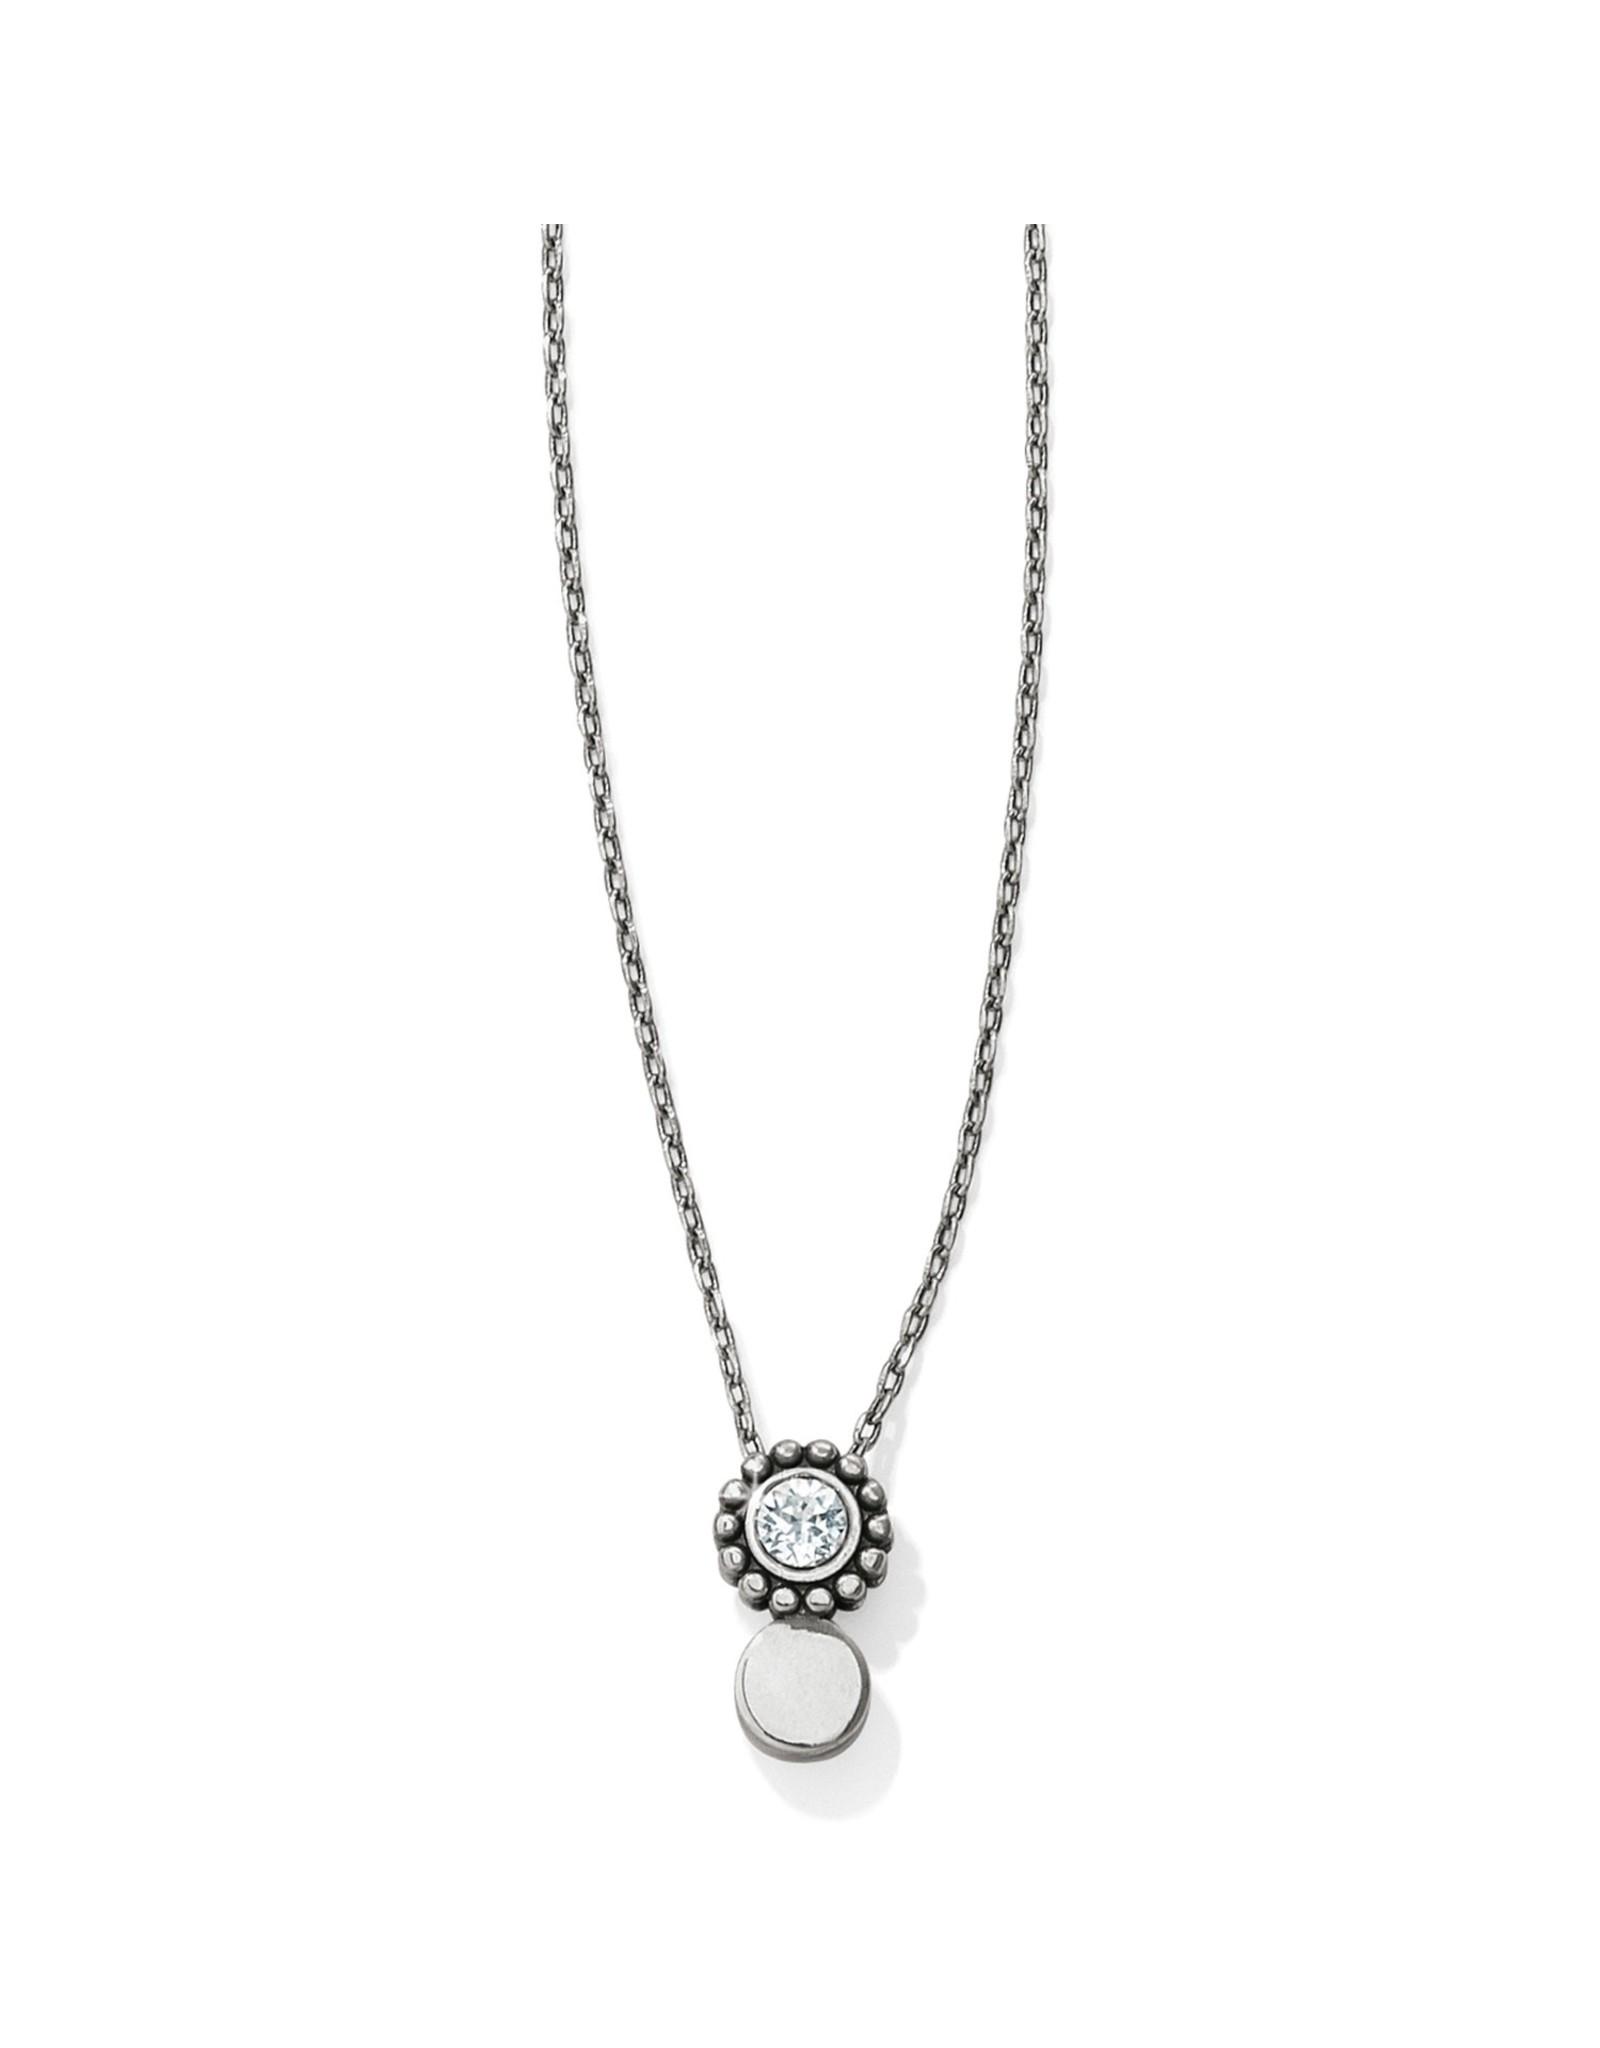 Brighton JL8571 Twinkle Double Drop Necklace